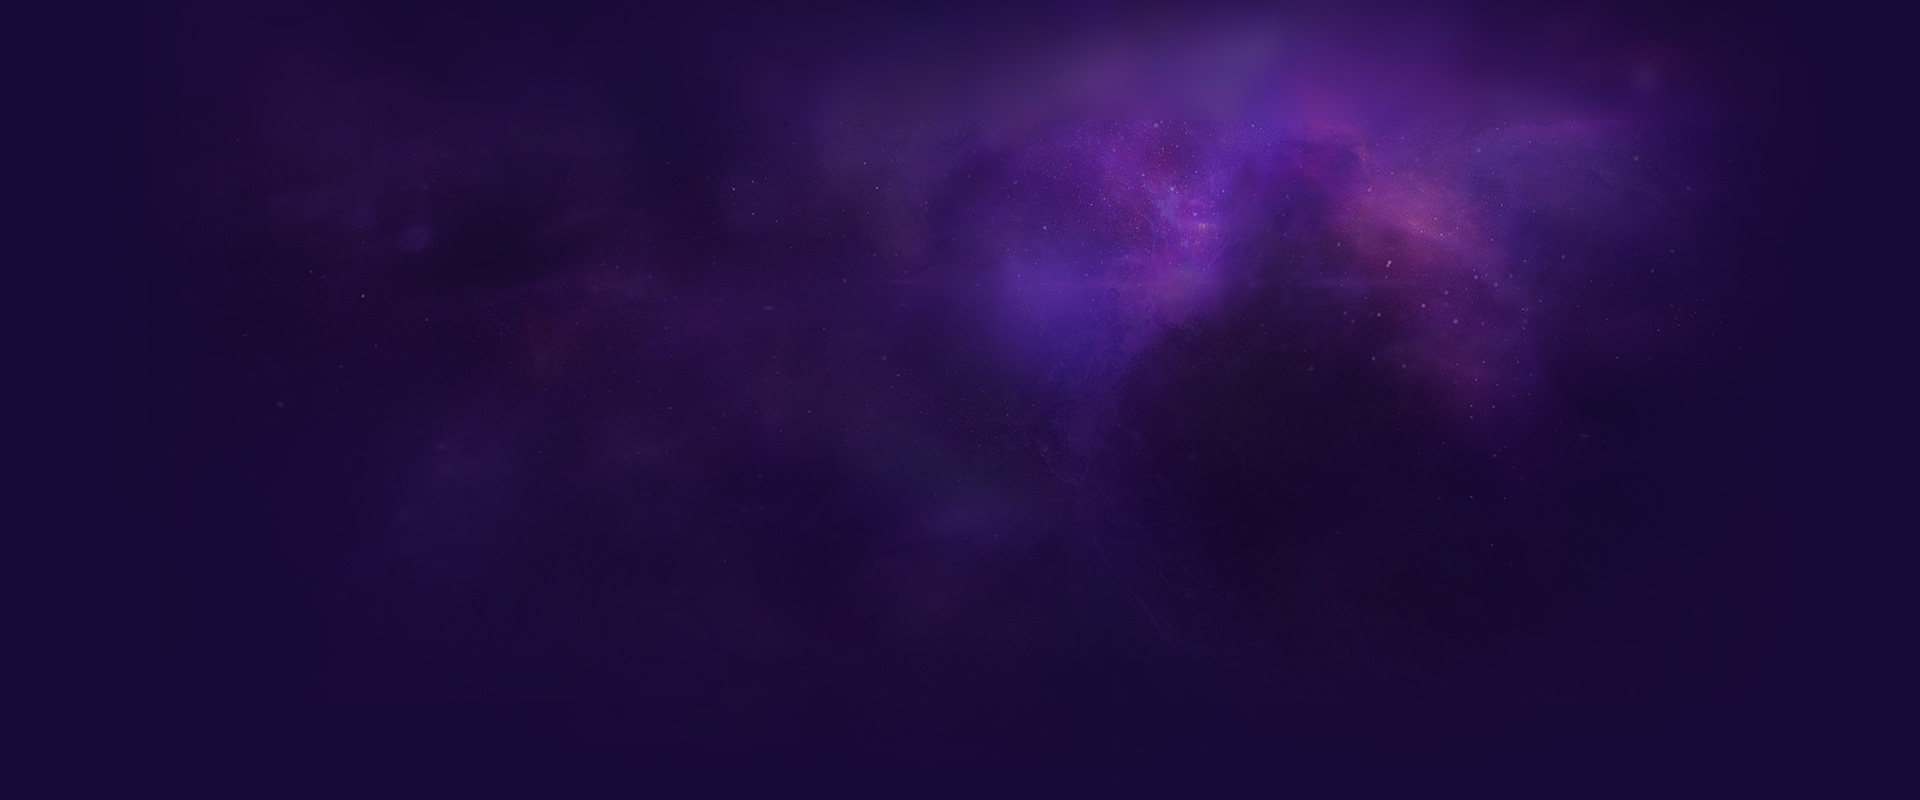 Destiny 2 PC Free on Battle net through November 18 — Blizzard News